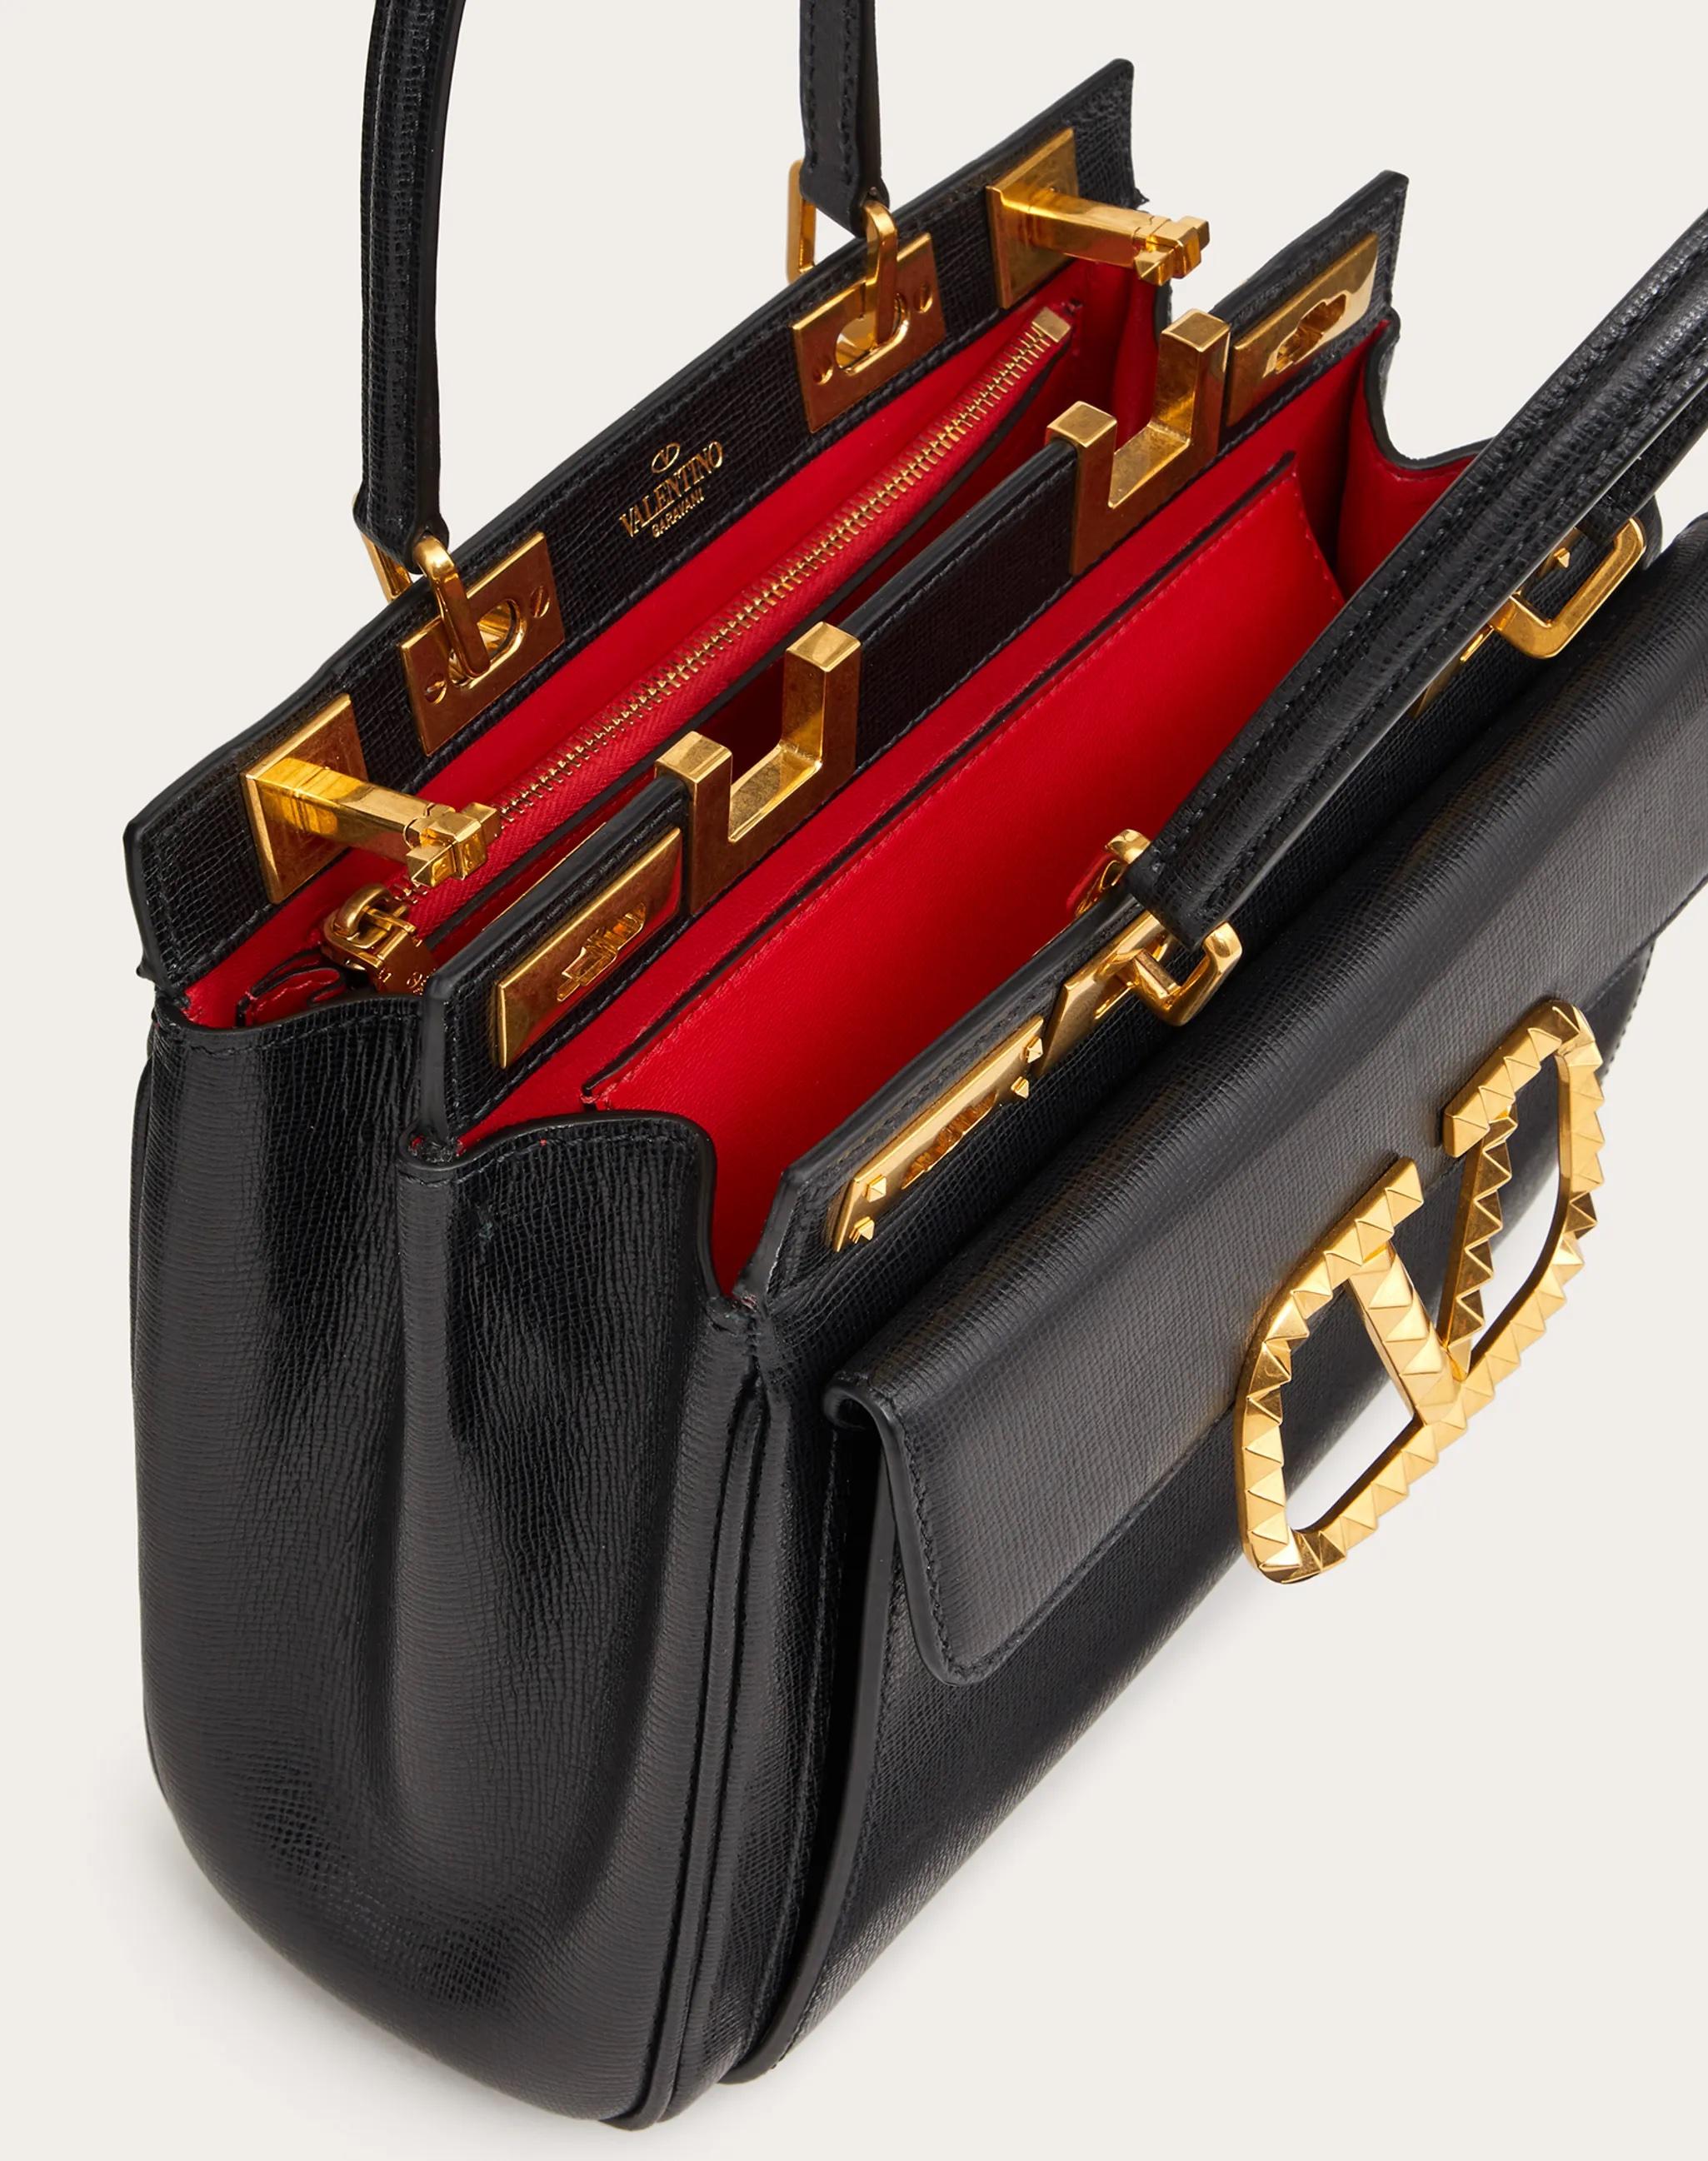 Valentino Garavani Rockstud Alcove double handle bag, il making of